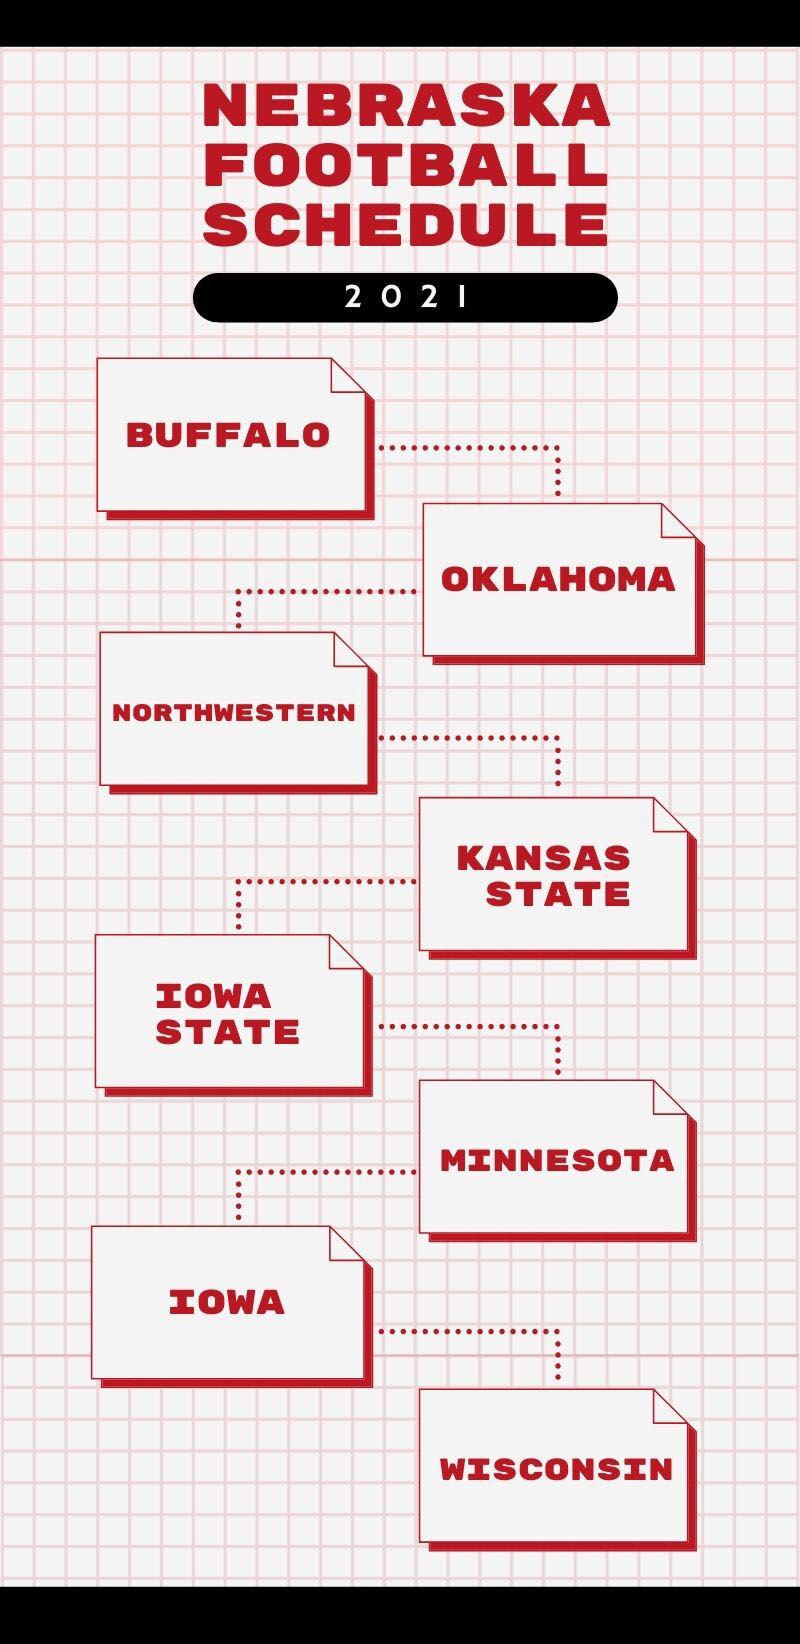 Proposed Nebraska football schedule